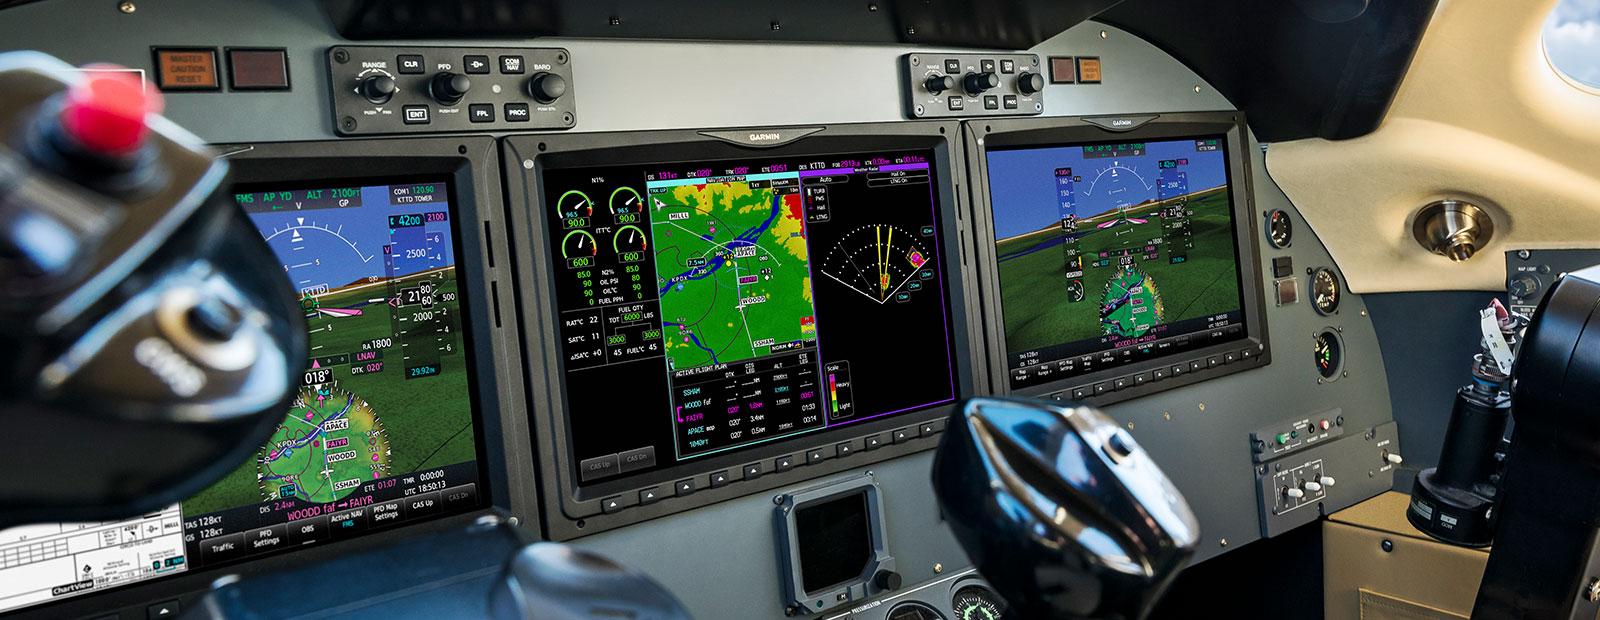 Business Aviation – Advanced Technologies & Sensors